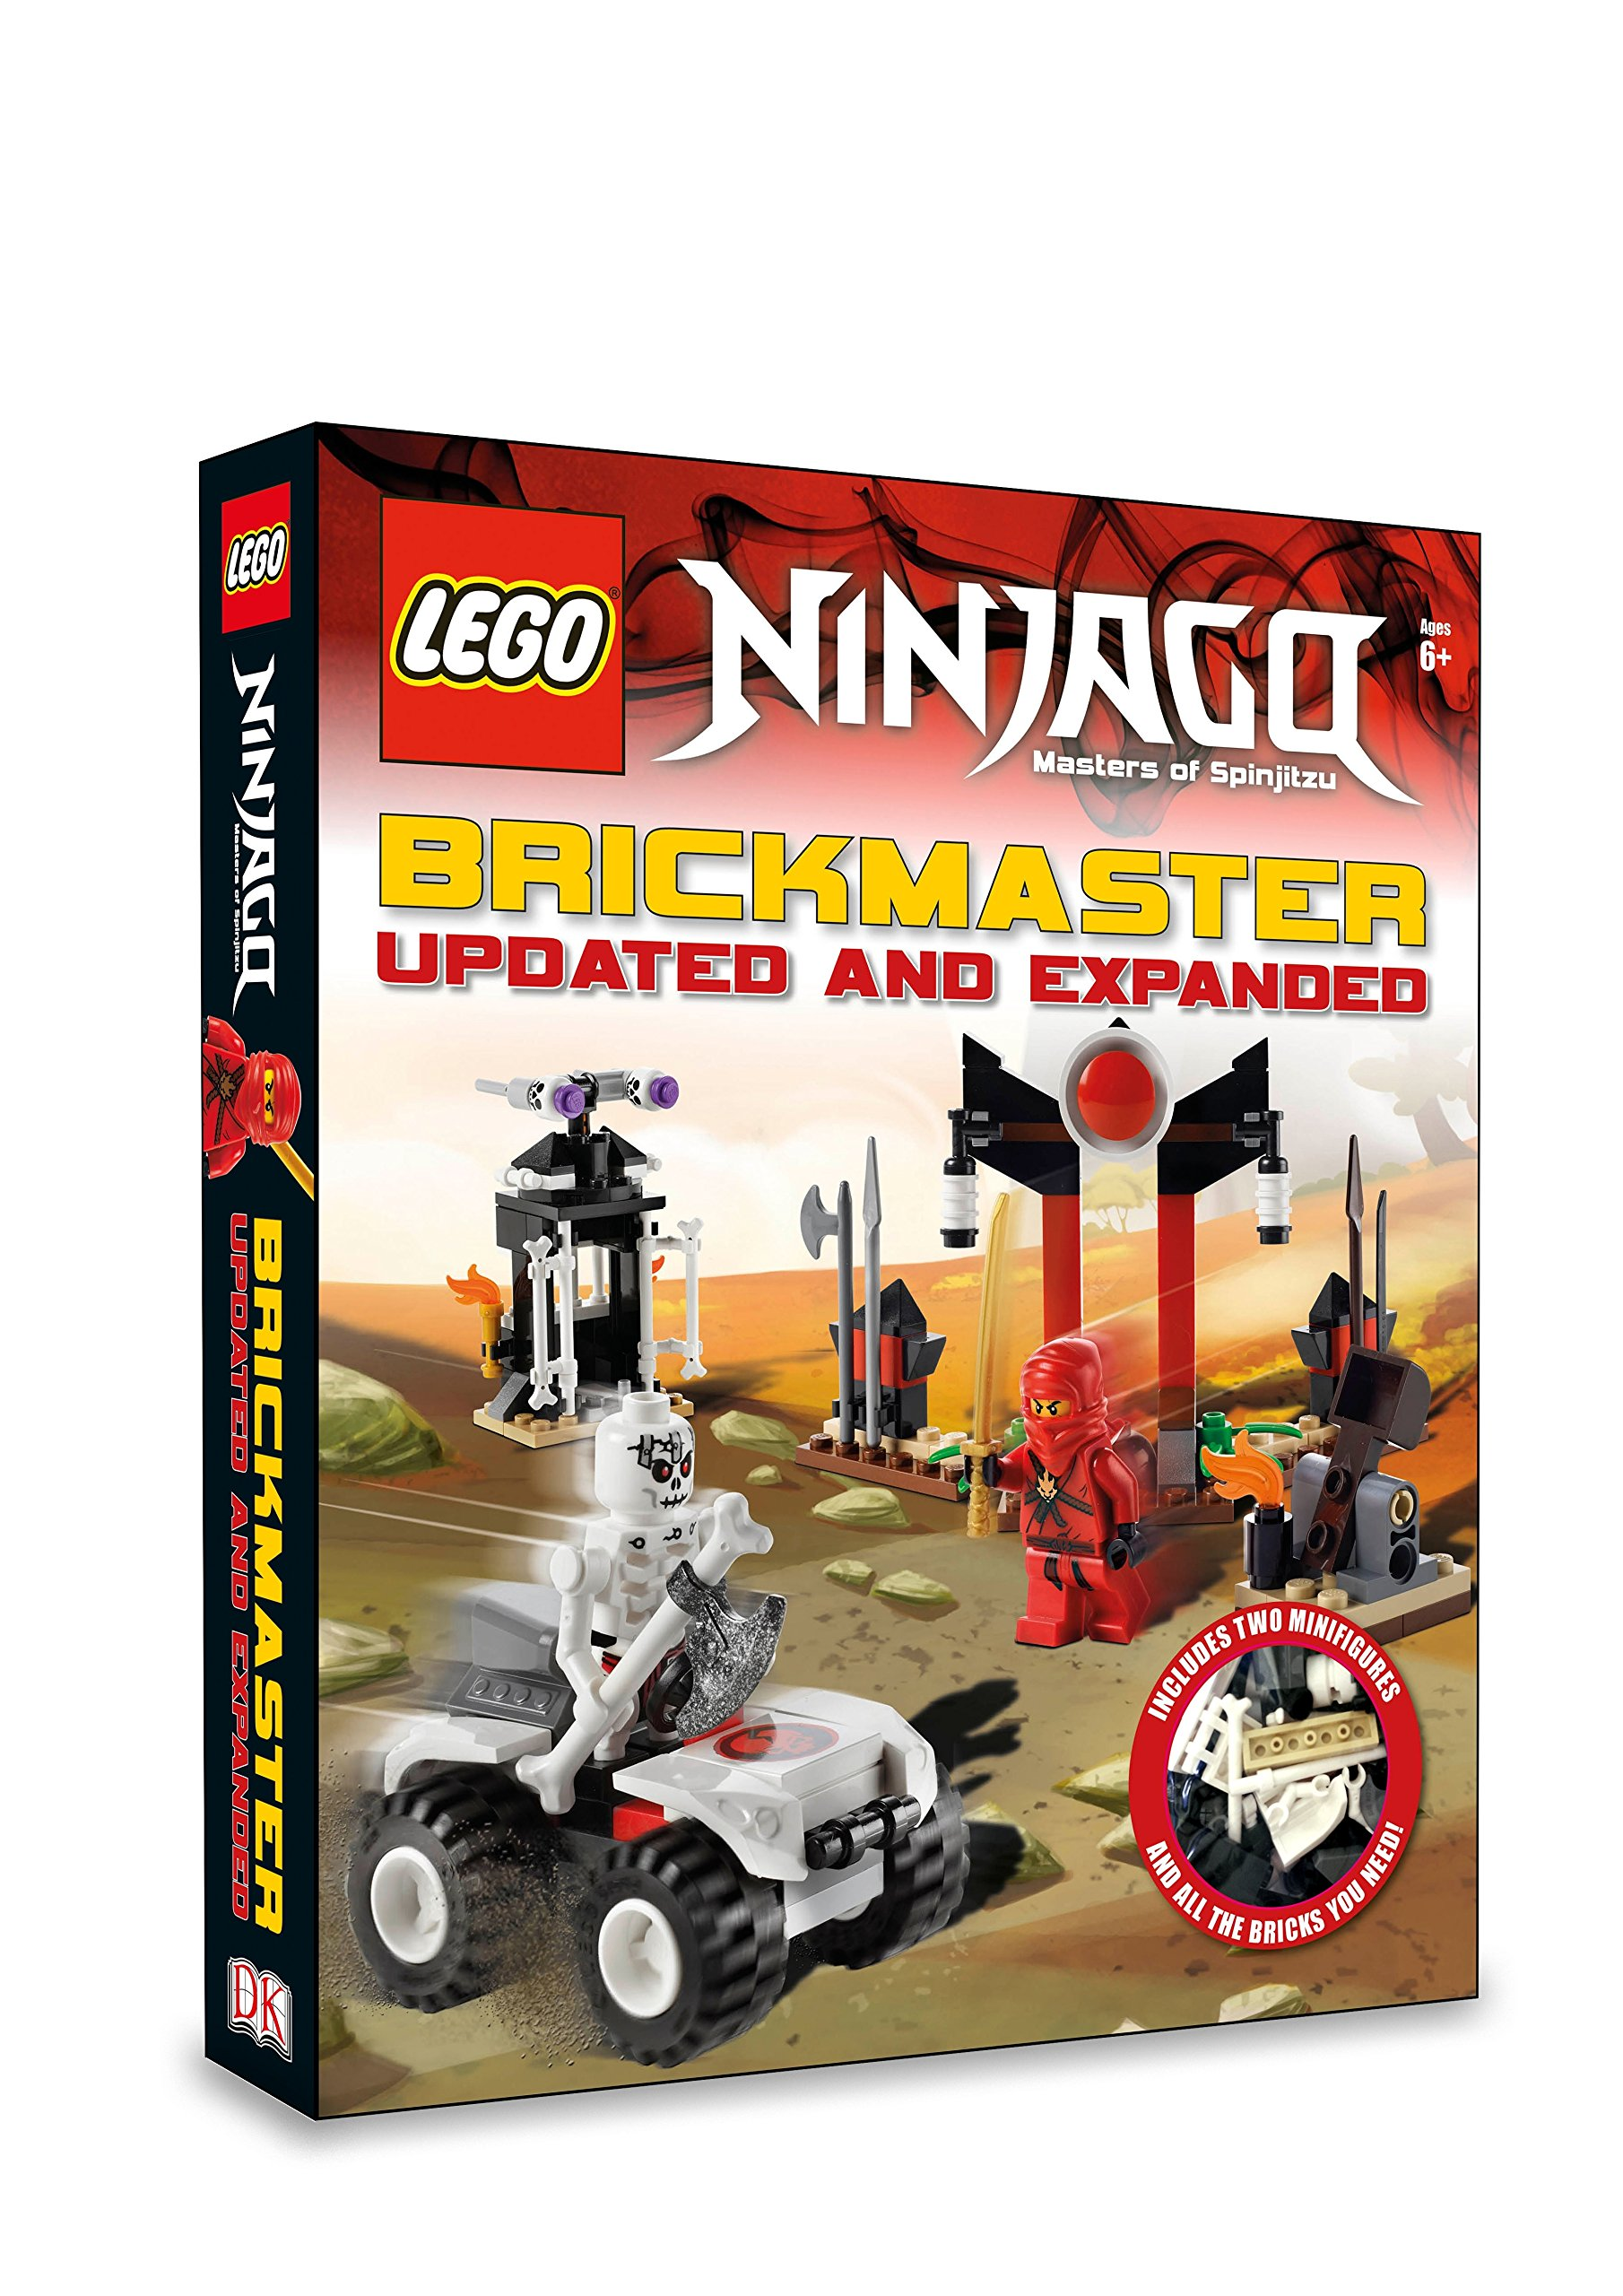 LEGO® Ninjago Brickmaster Updated and Expanded Lego Brickmaster: Amazon.de:  Last, Shari: Fremdsprachige Bücher